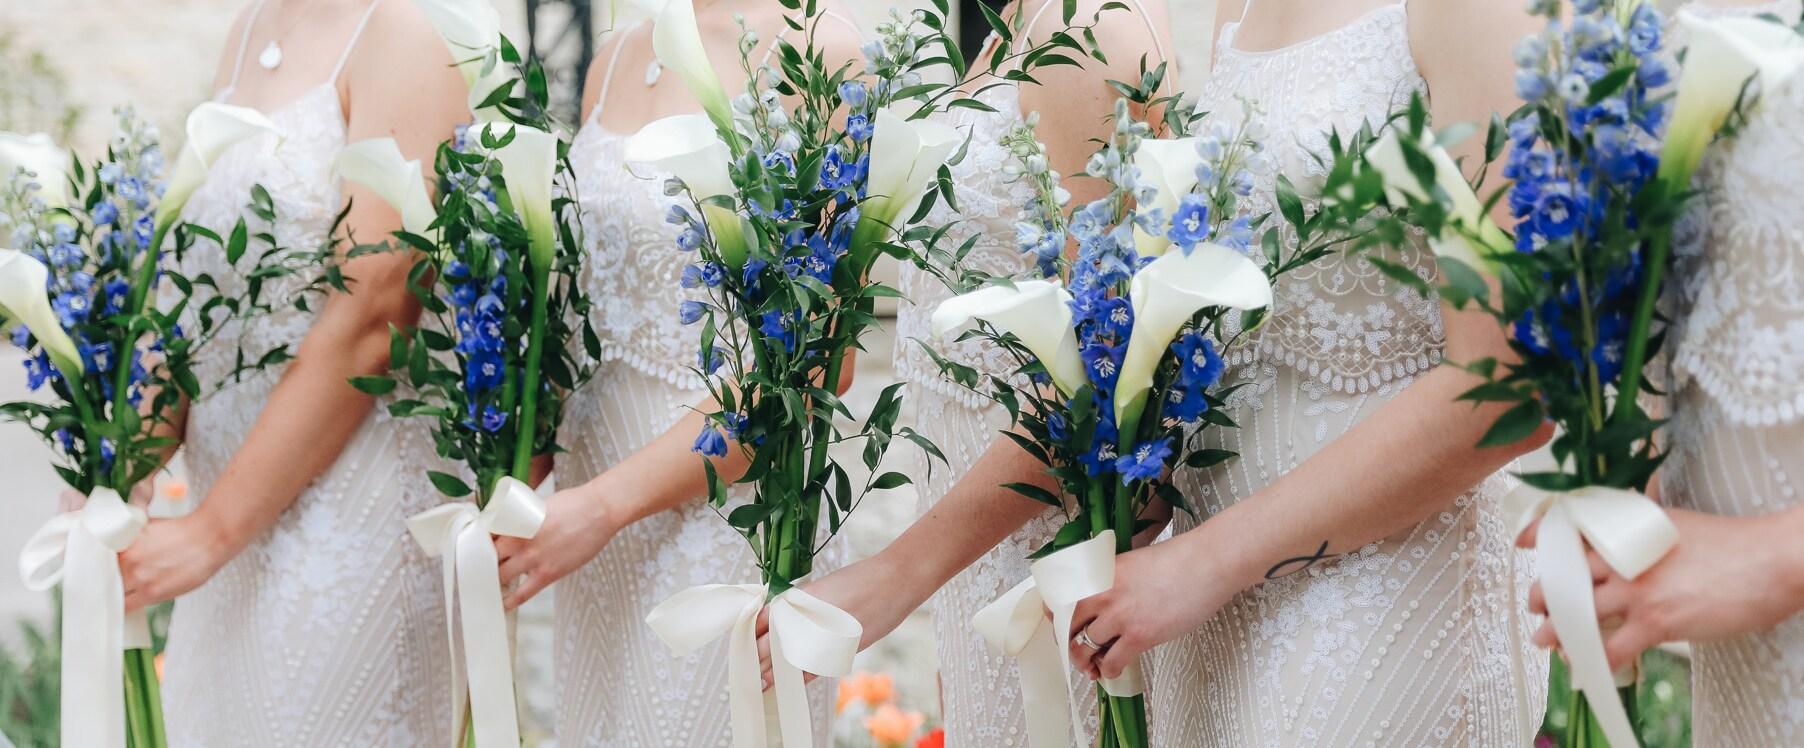 Felly's Flowers Wedding Consultation